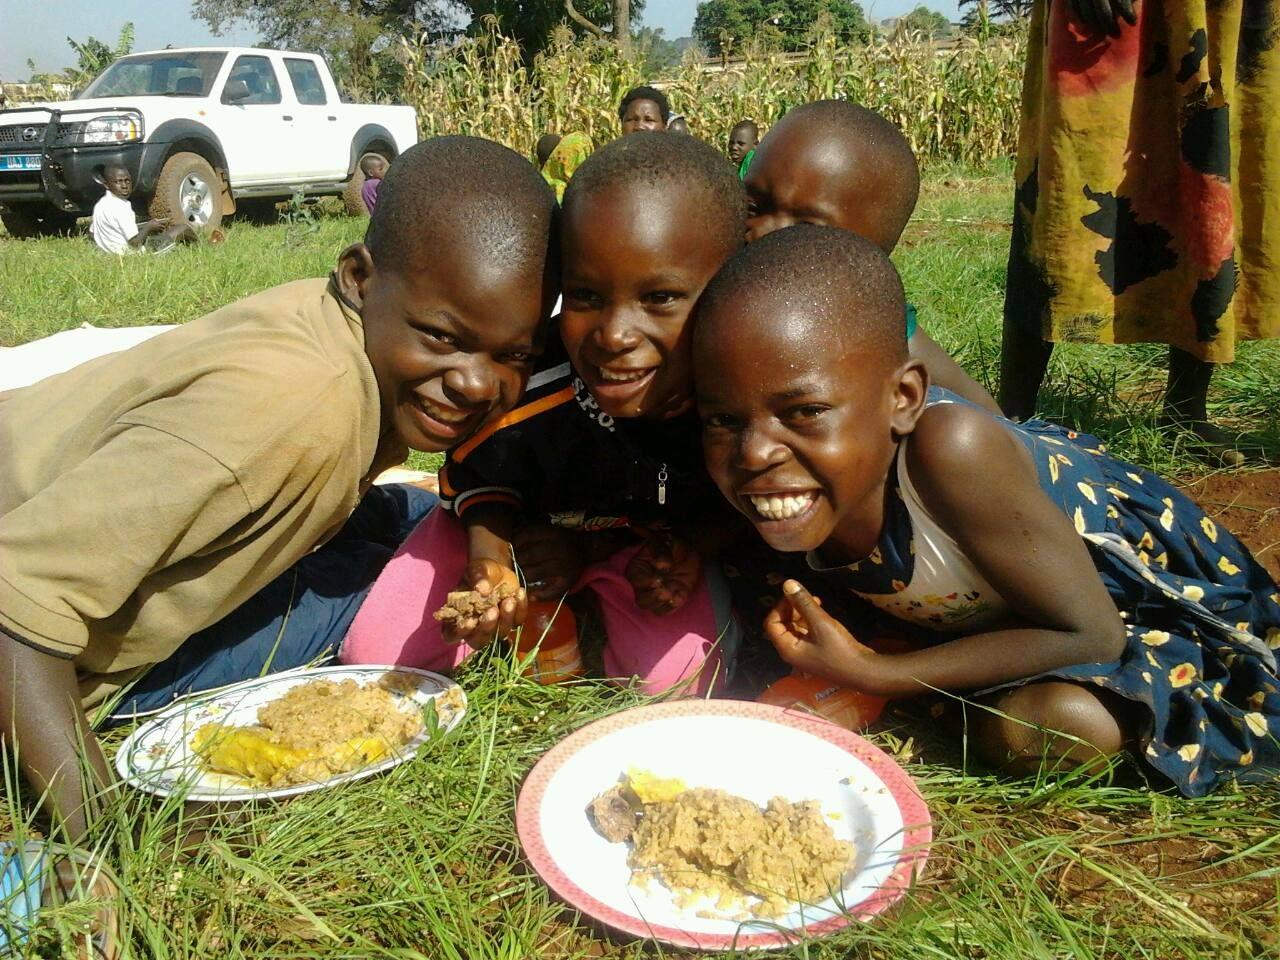 Pin on Face of Hope International Uganda